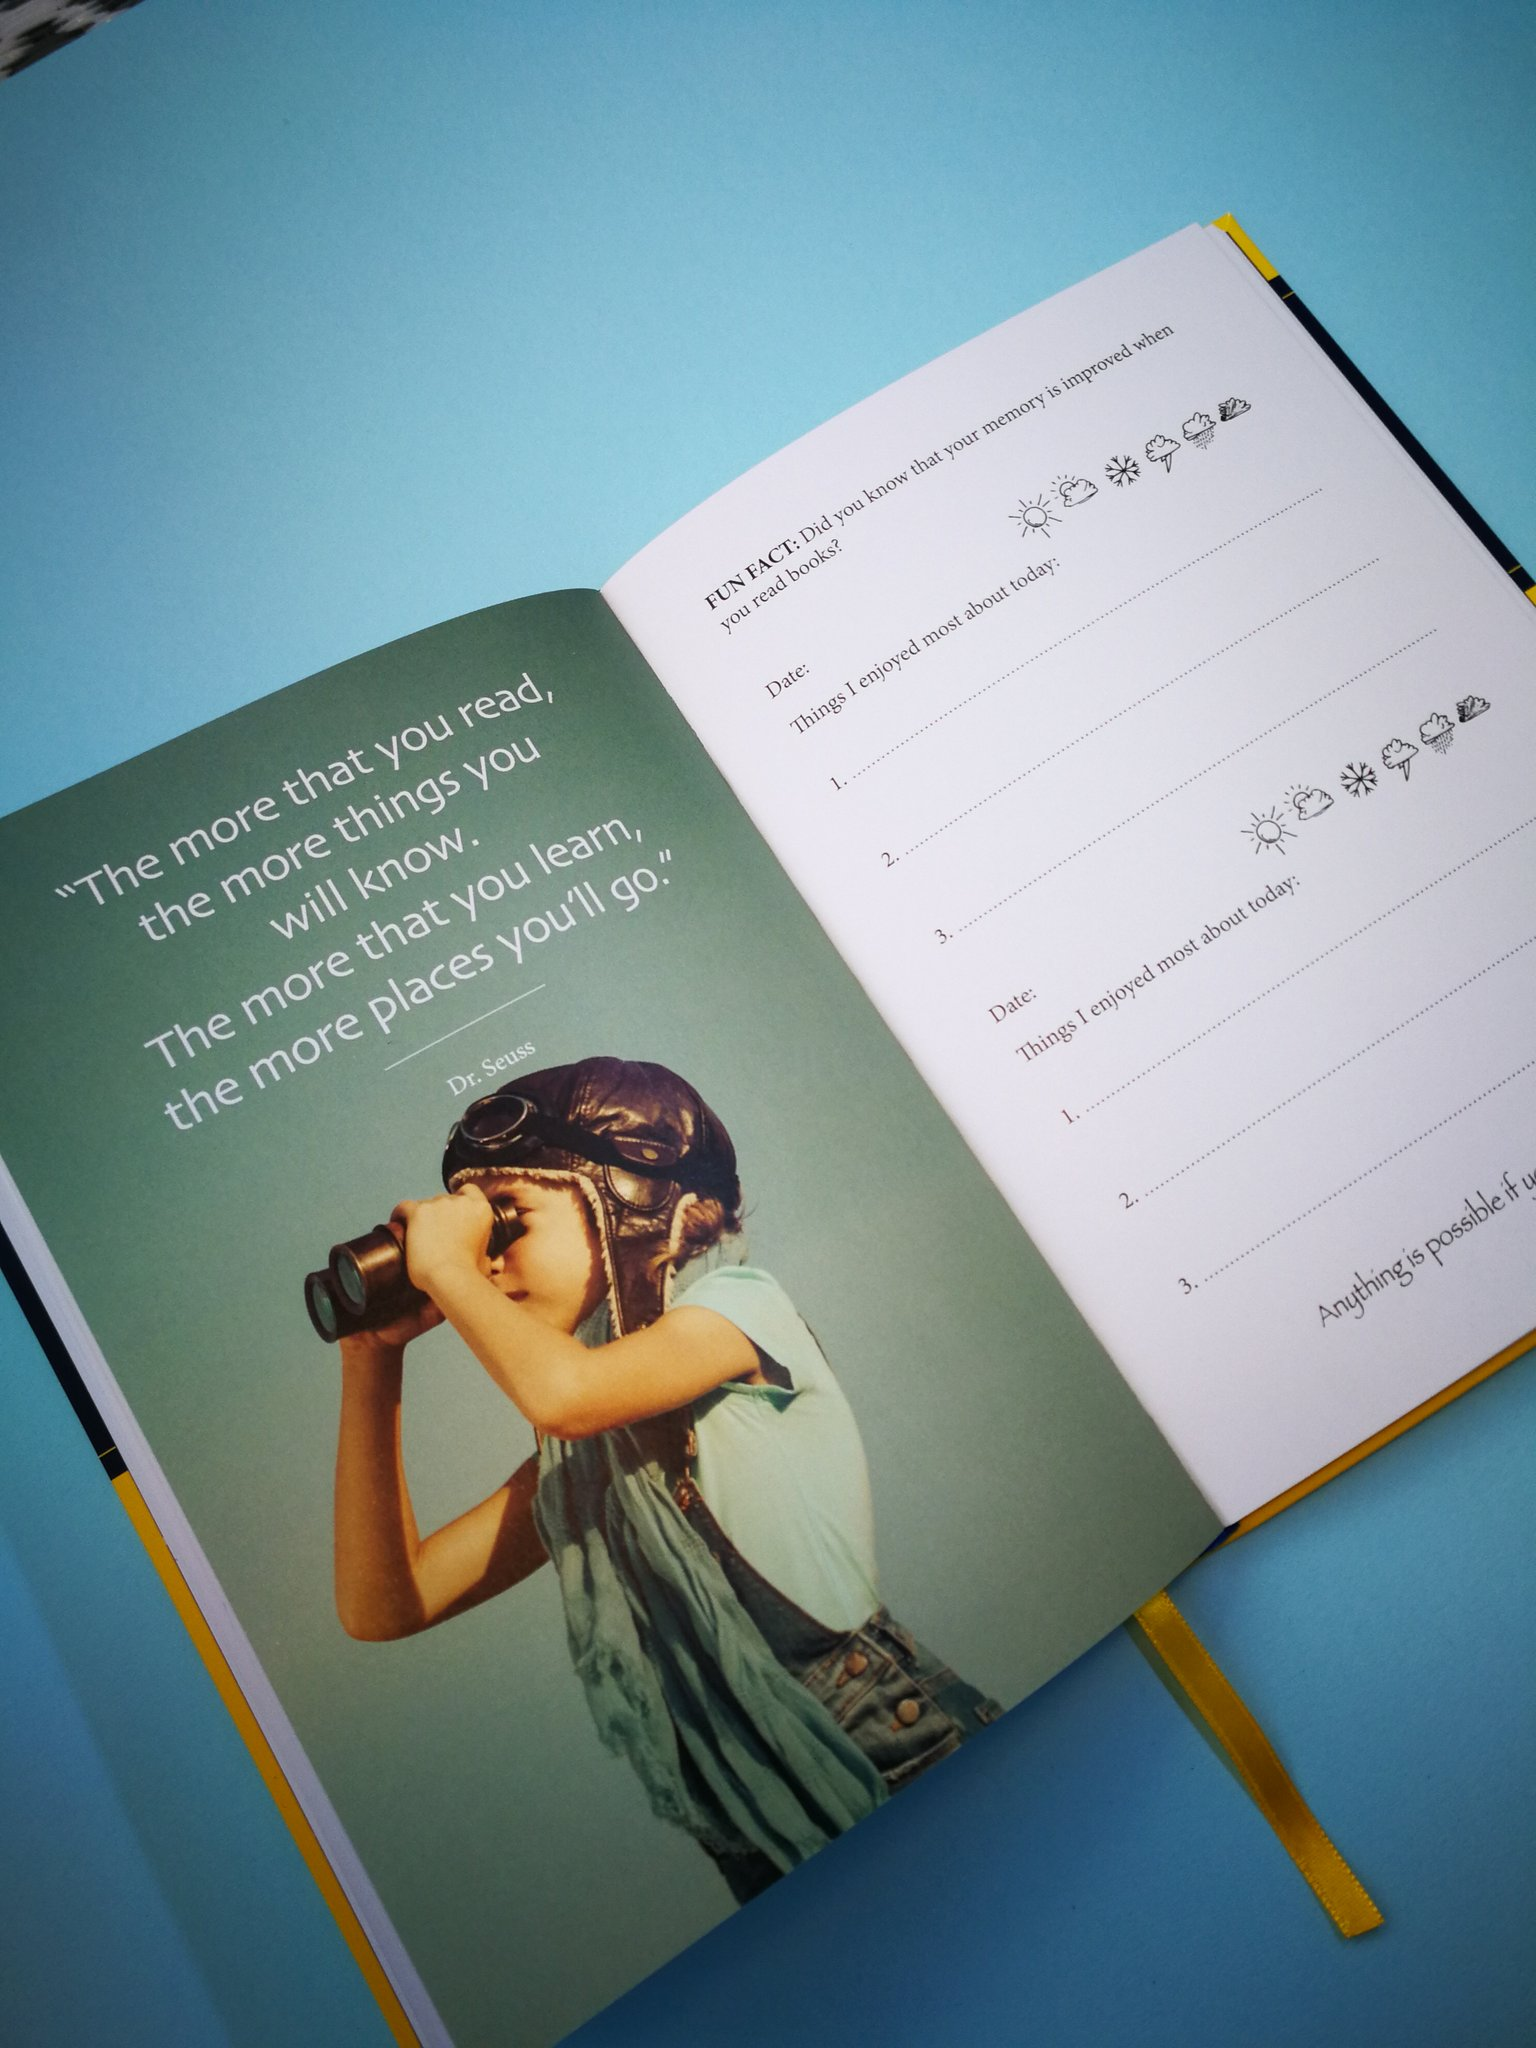 My Happy Journal